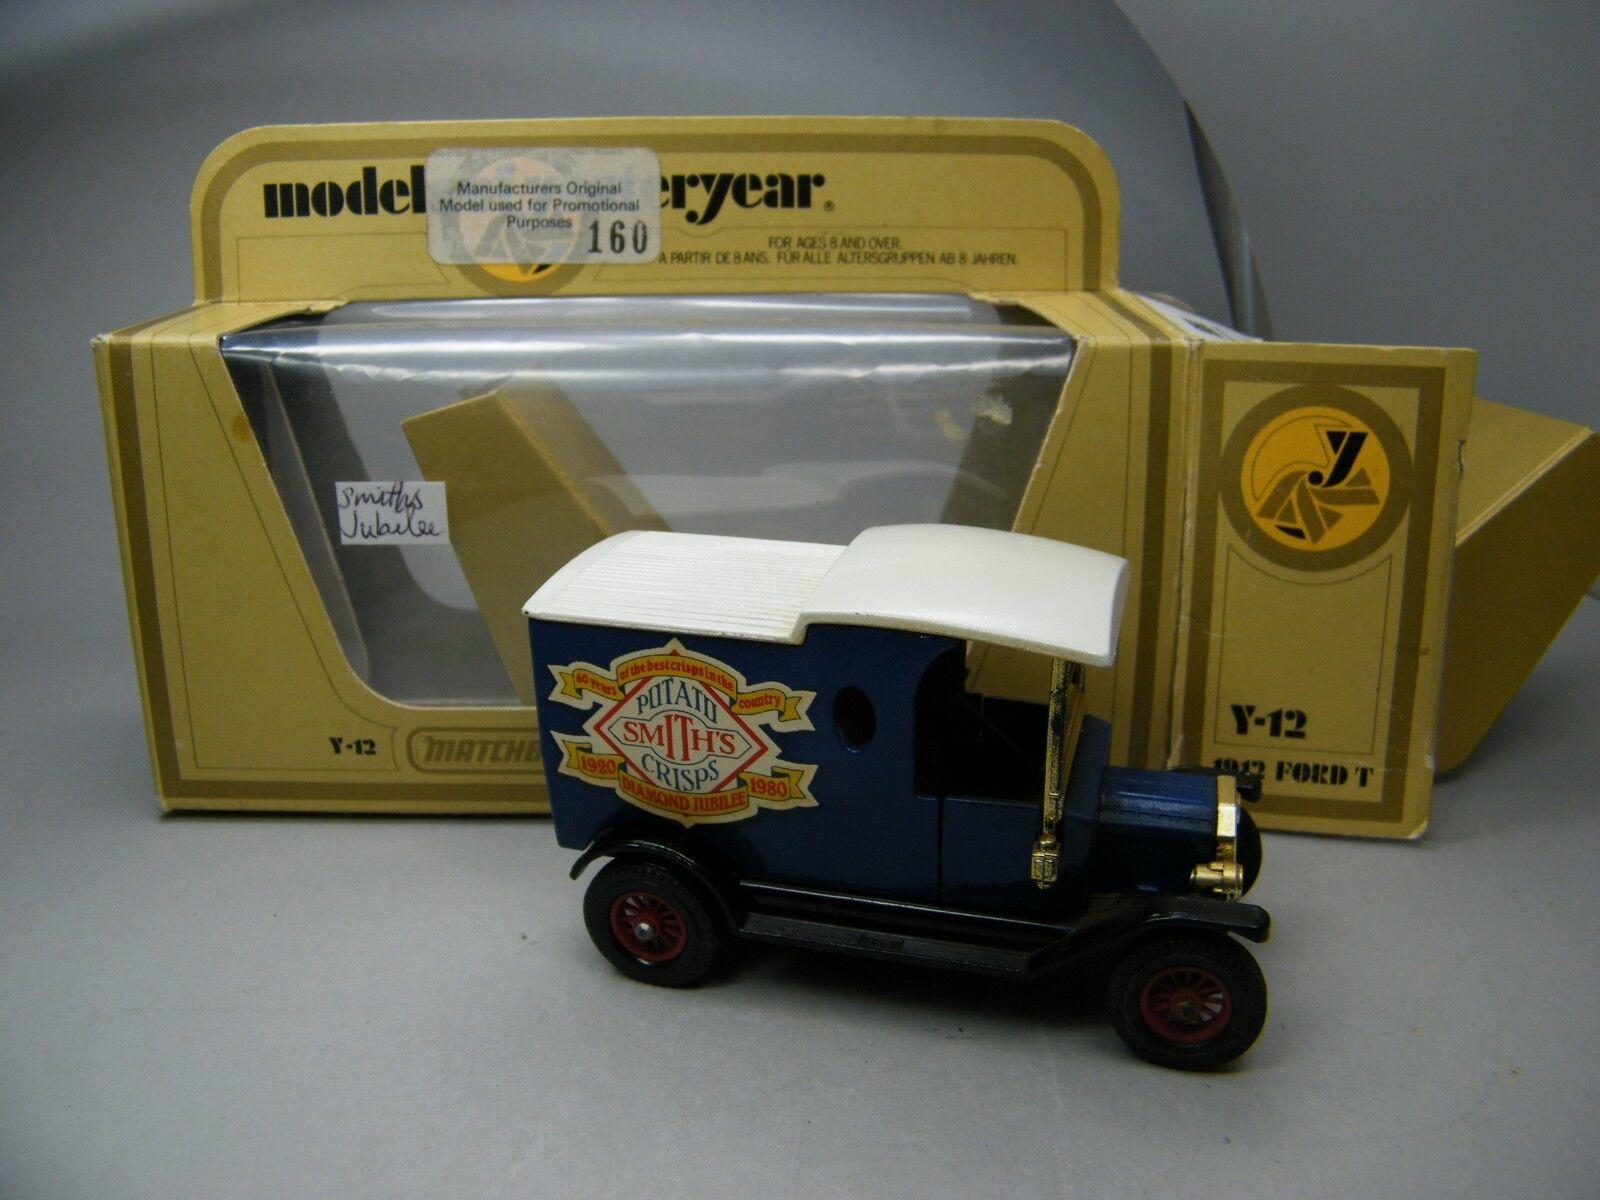 Matchbox MoY C3 Ford T Smith Crips - sehr seltenes Werbemodell UK OVP Bilder K02